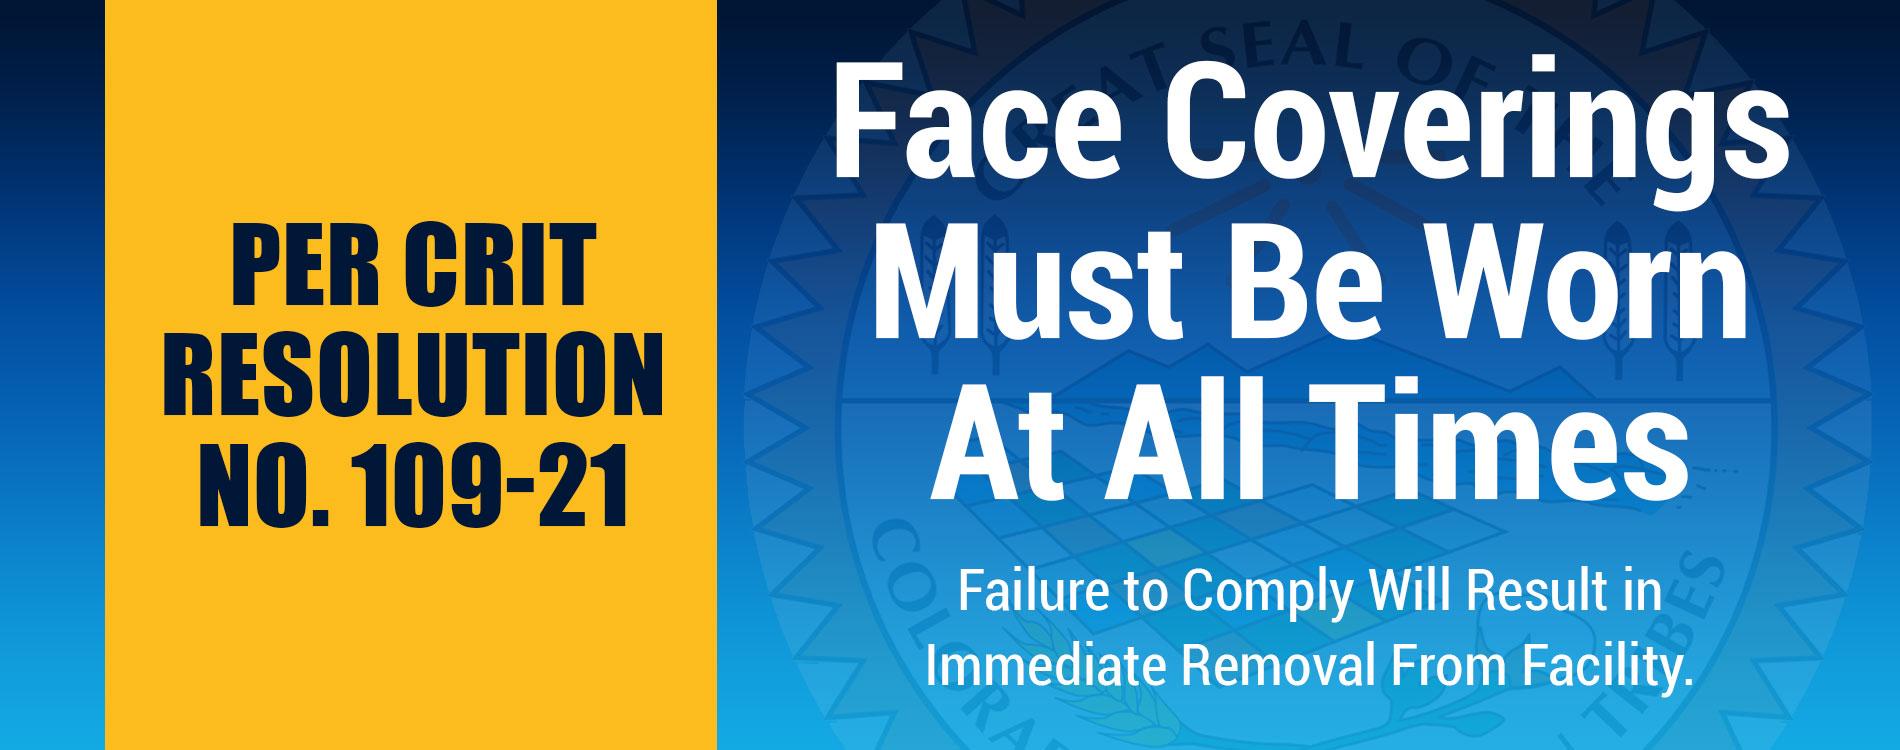 Facecoverings-Resolution-Web-Header